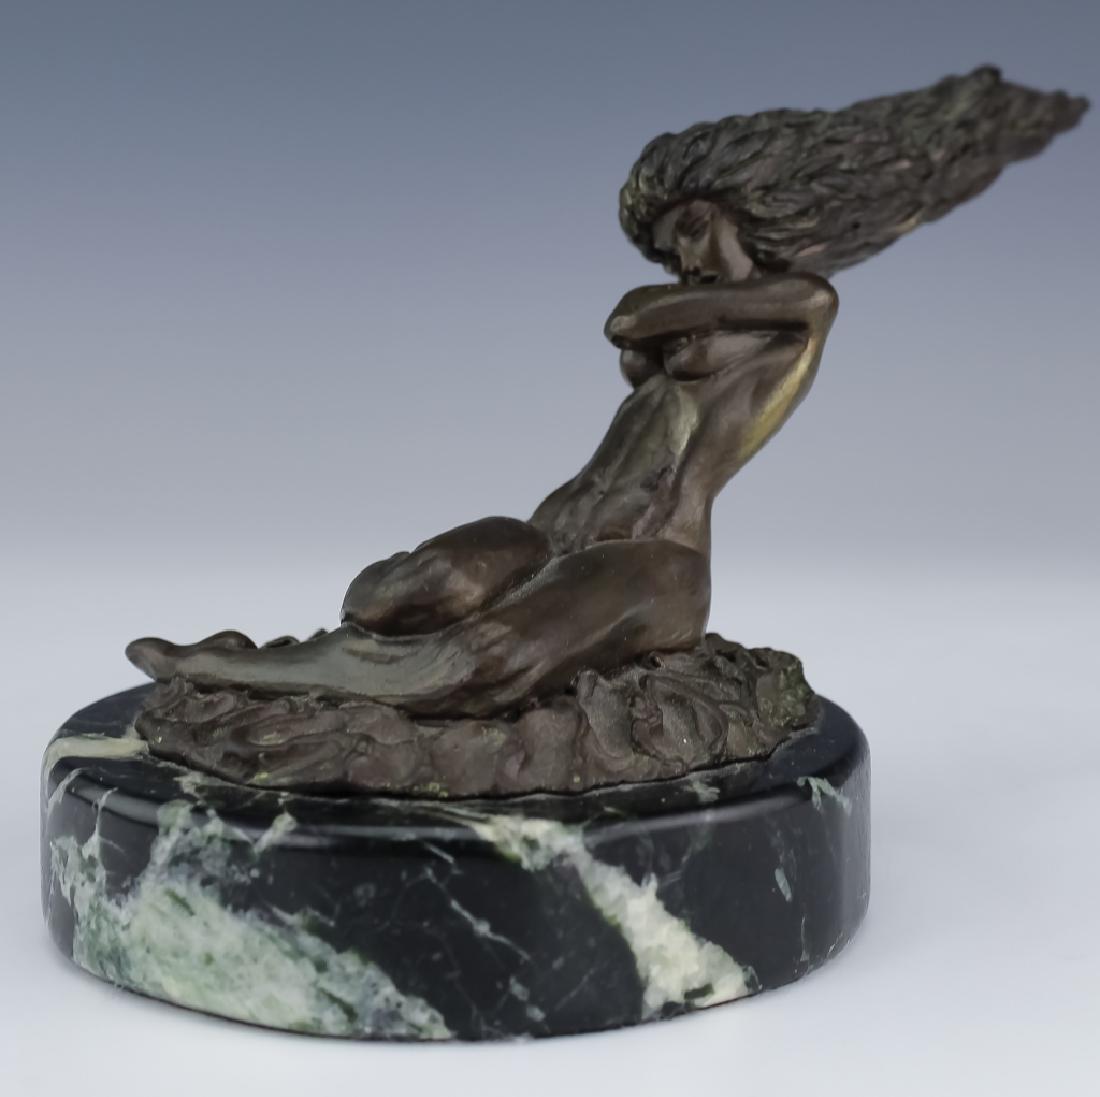 Tom Bennett Female Nude Bronze LE Art Sculpture - 2